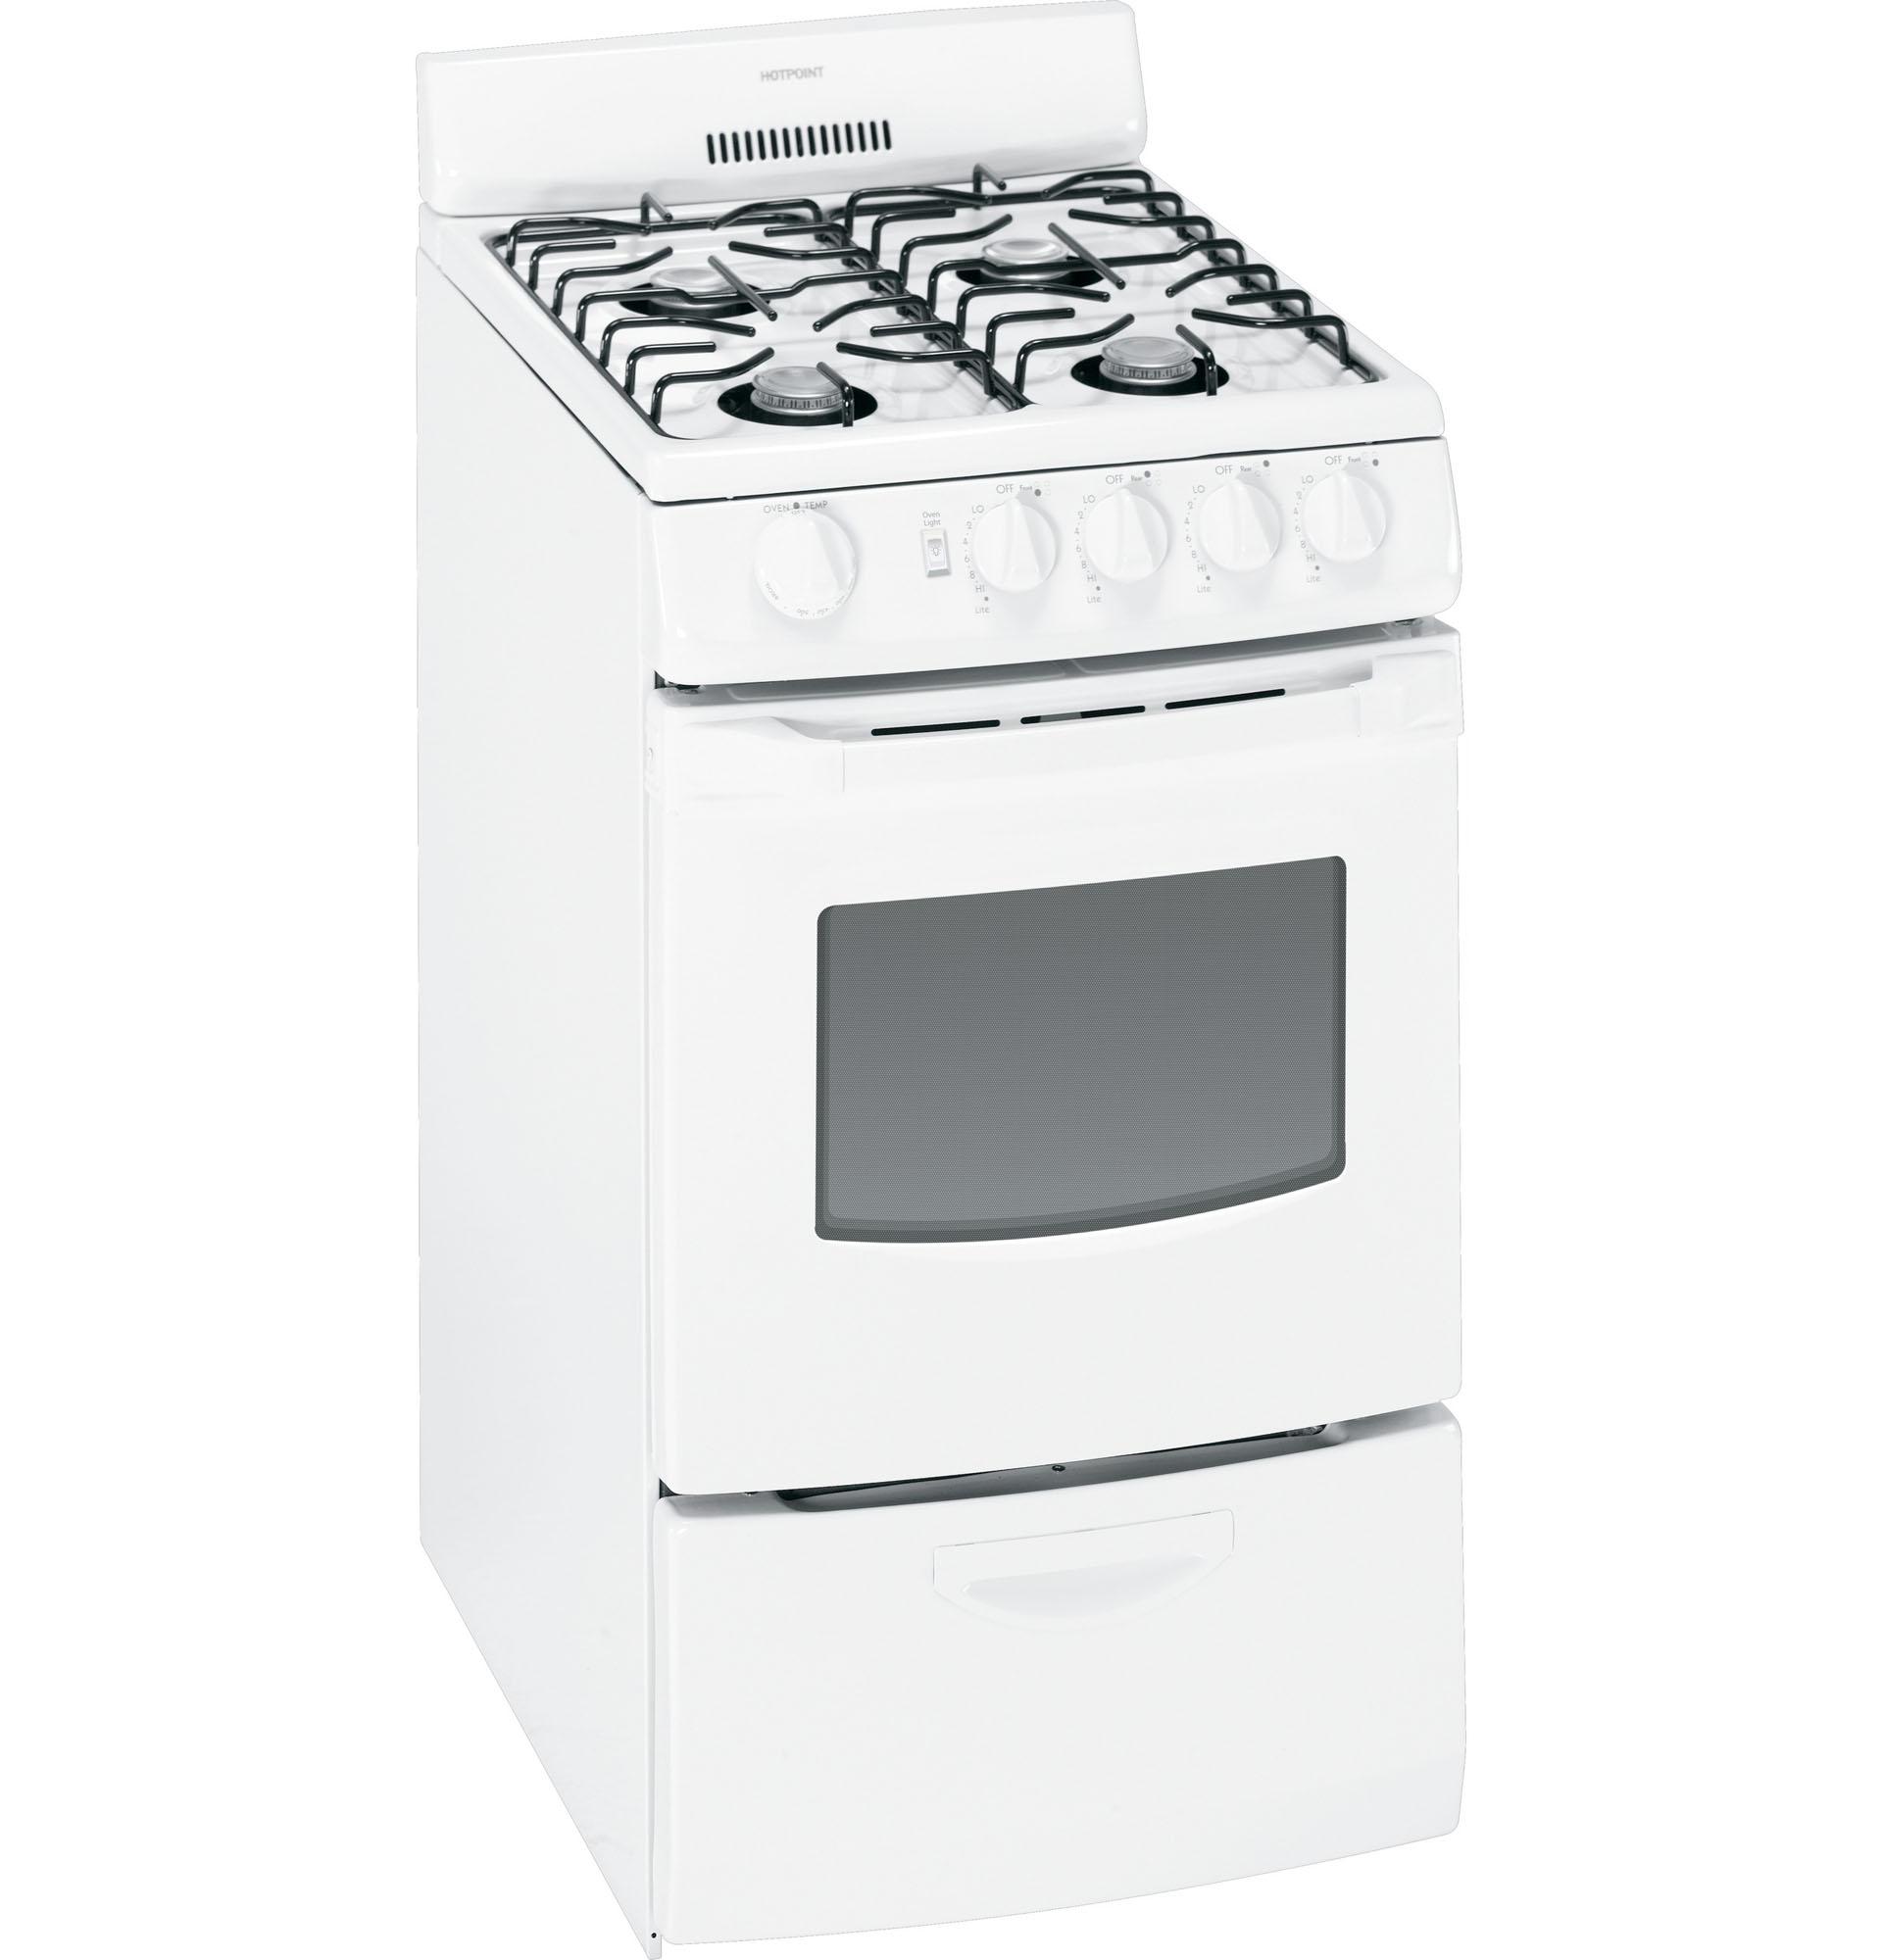 Hotpoint RGA820DEDWW 2.4 cu. ft. Freestanding Gas Range - White